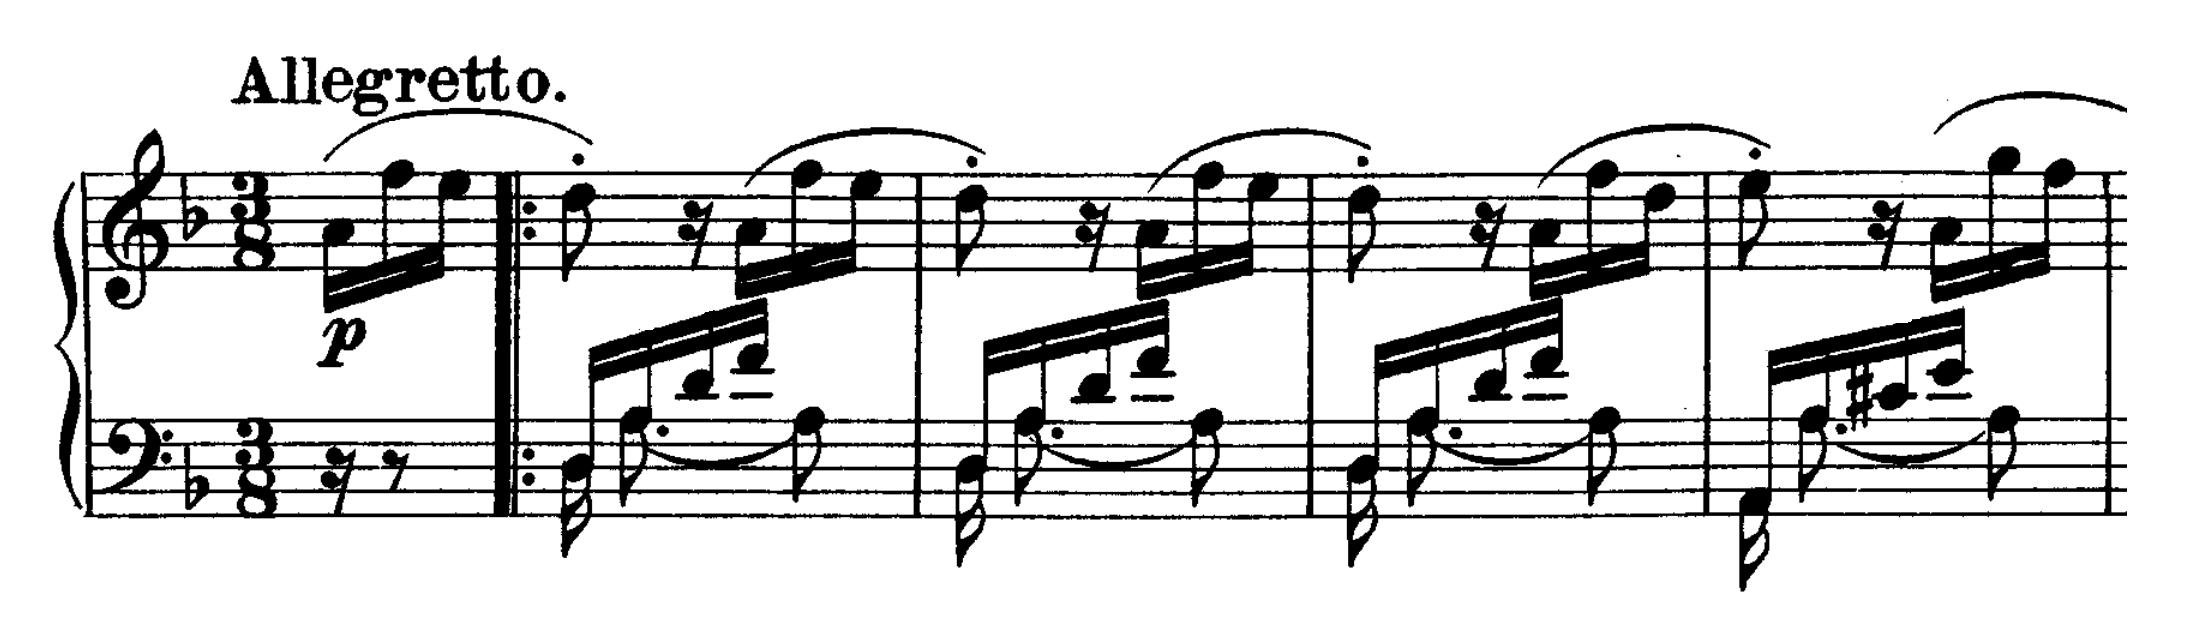 Beethoven: Piano Sonata No 17 in D minor